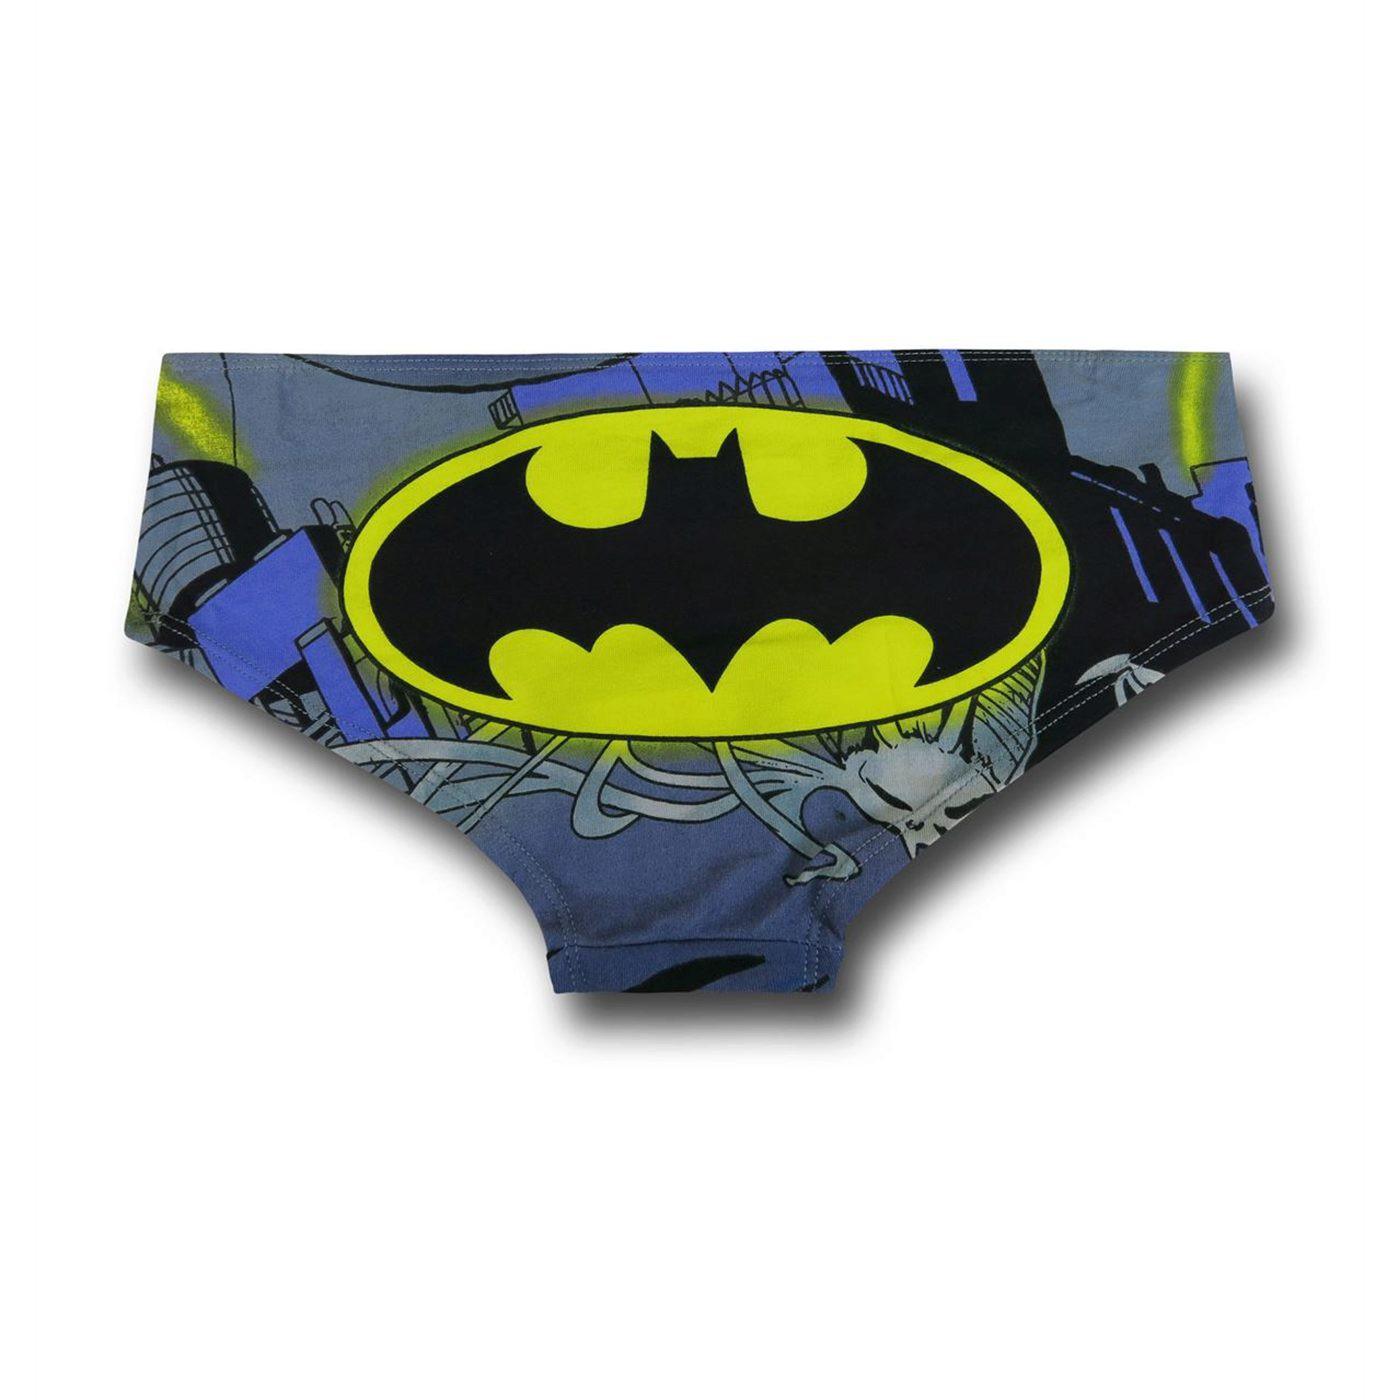 Batman Flying Rays Women's Panty